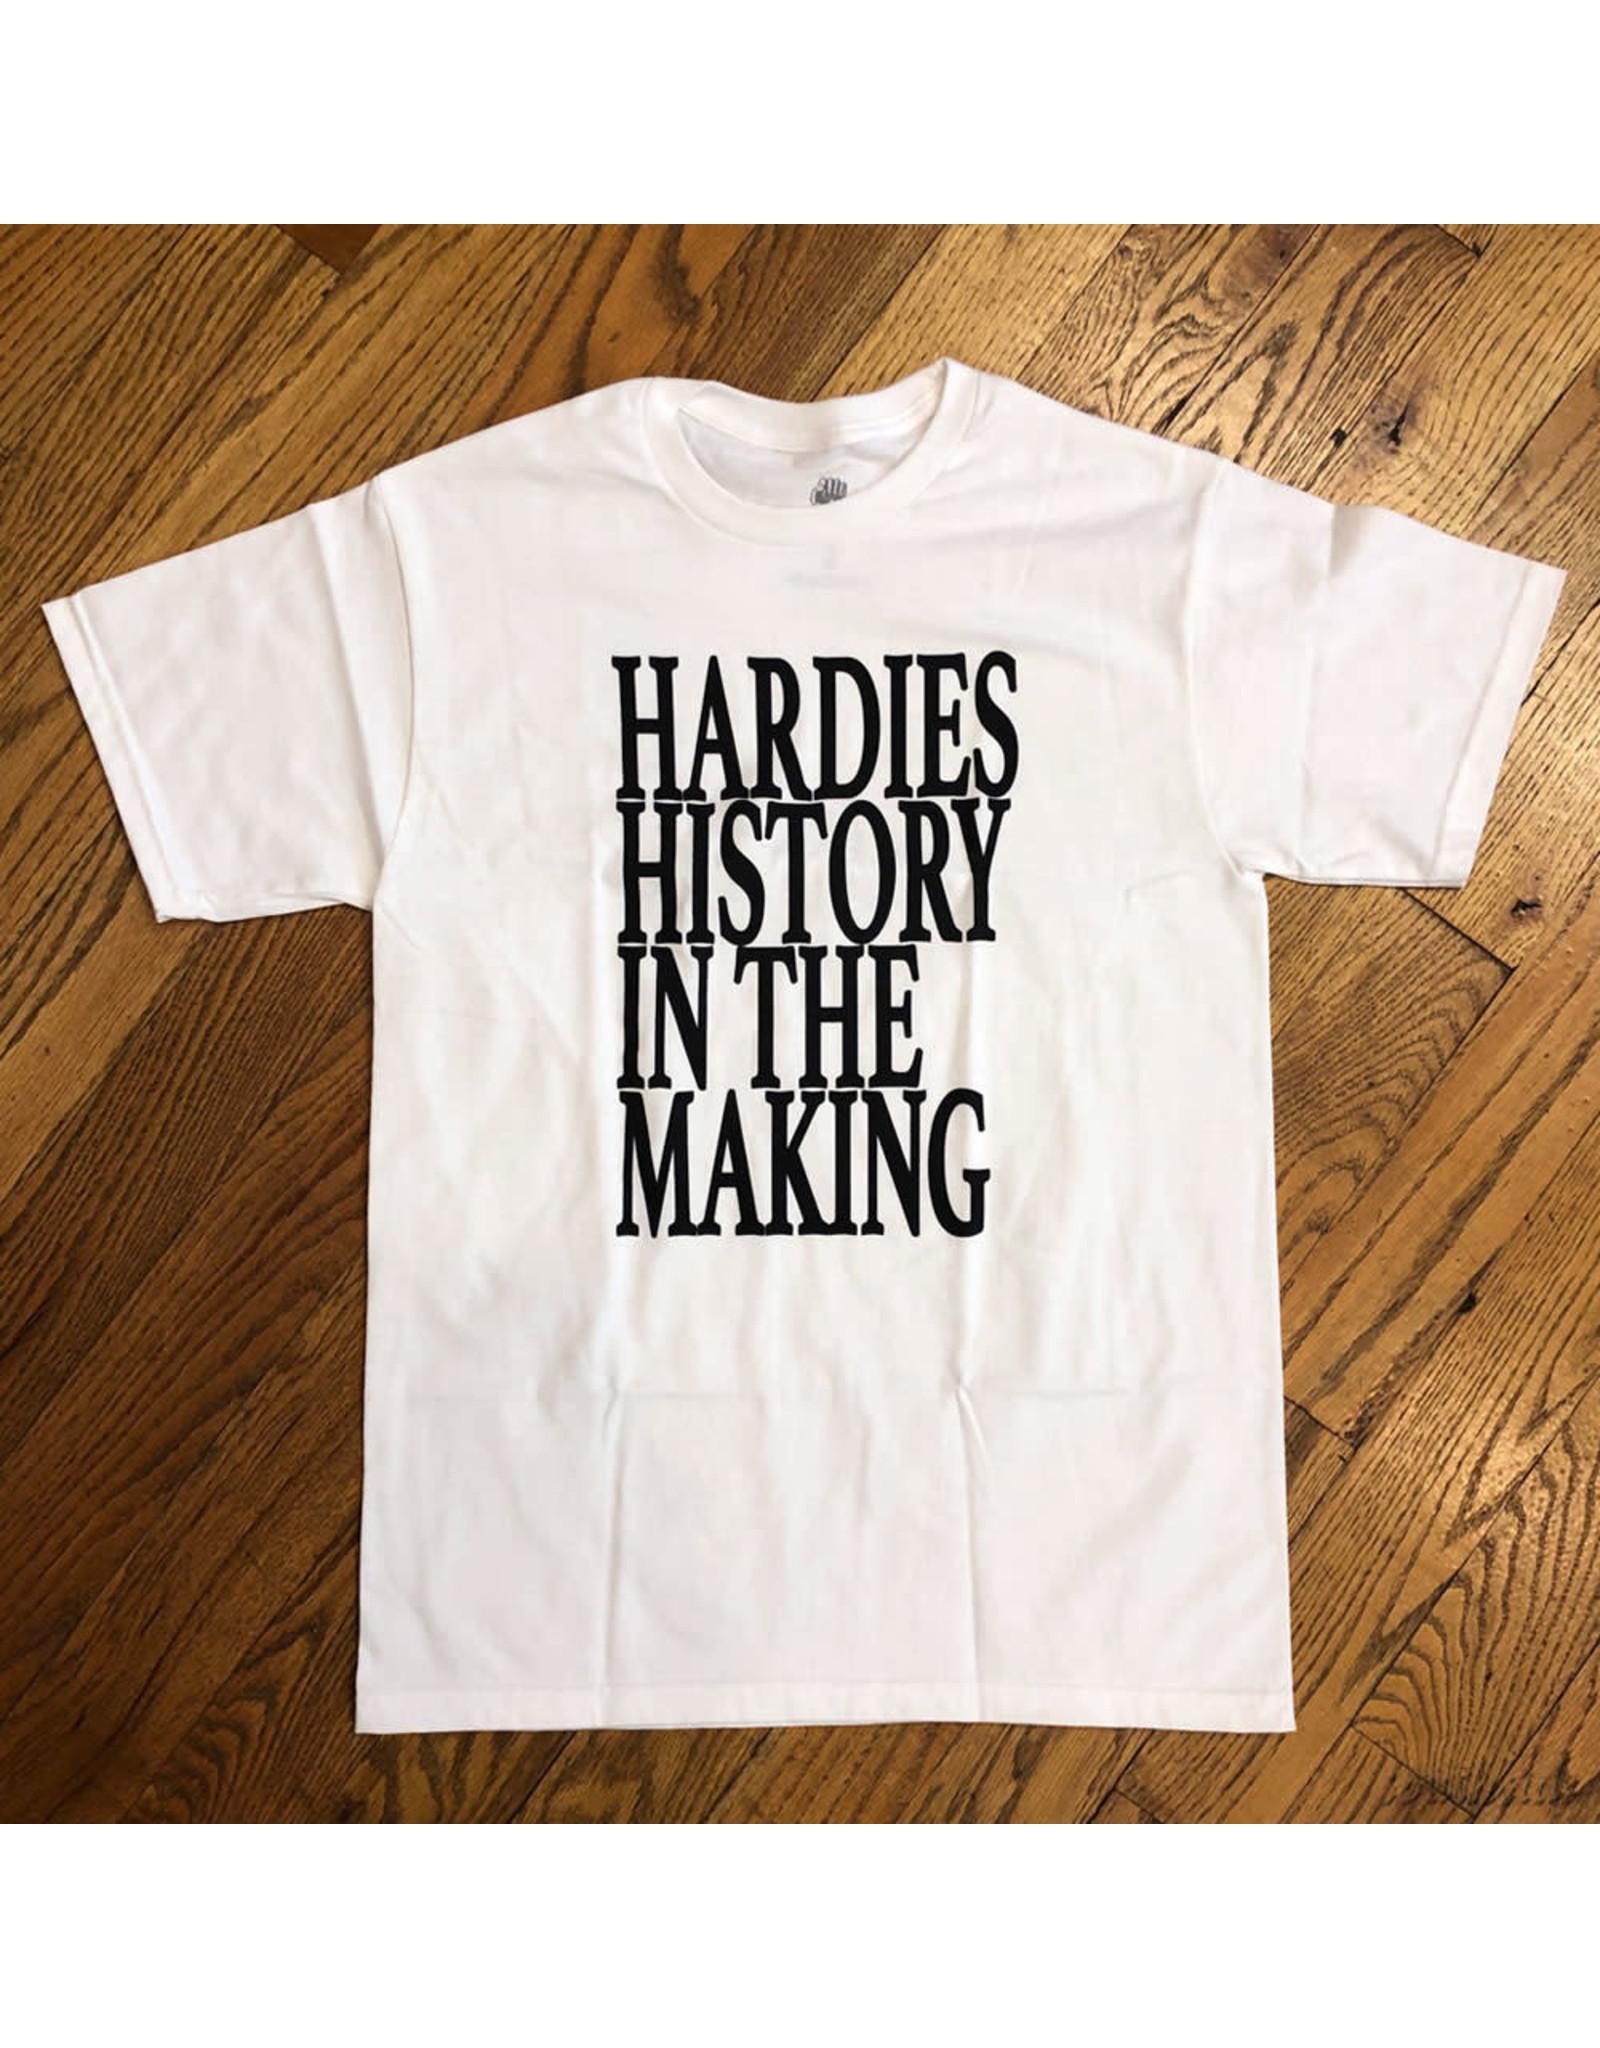 Hardies Tee History In The Making White